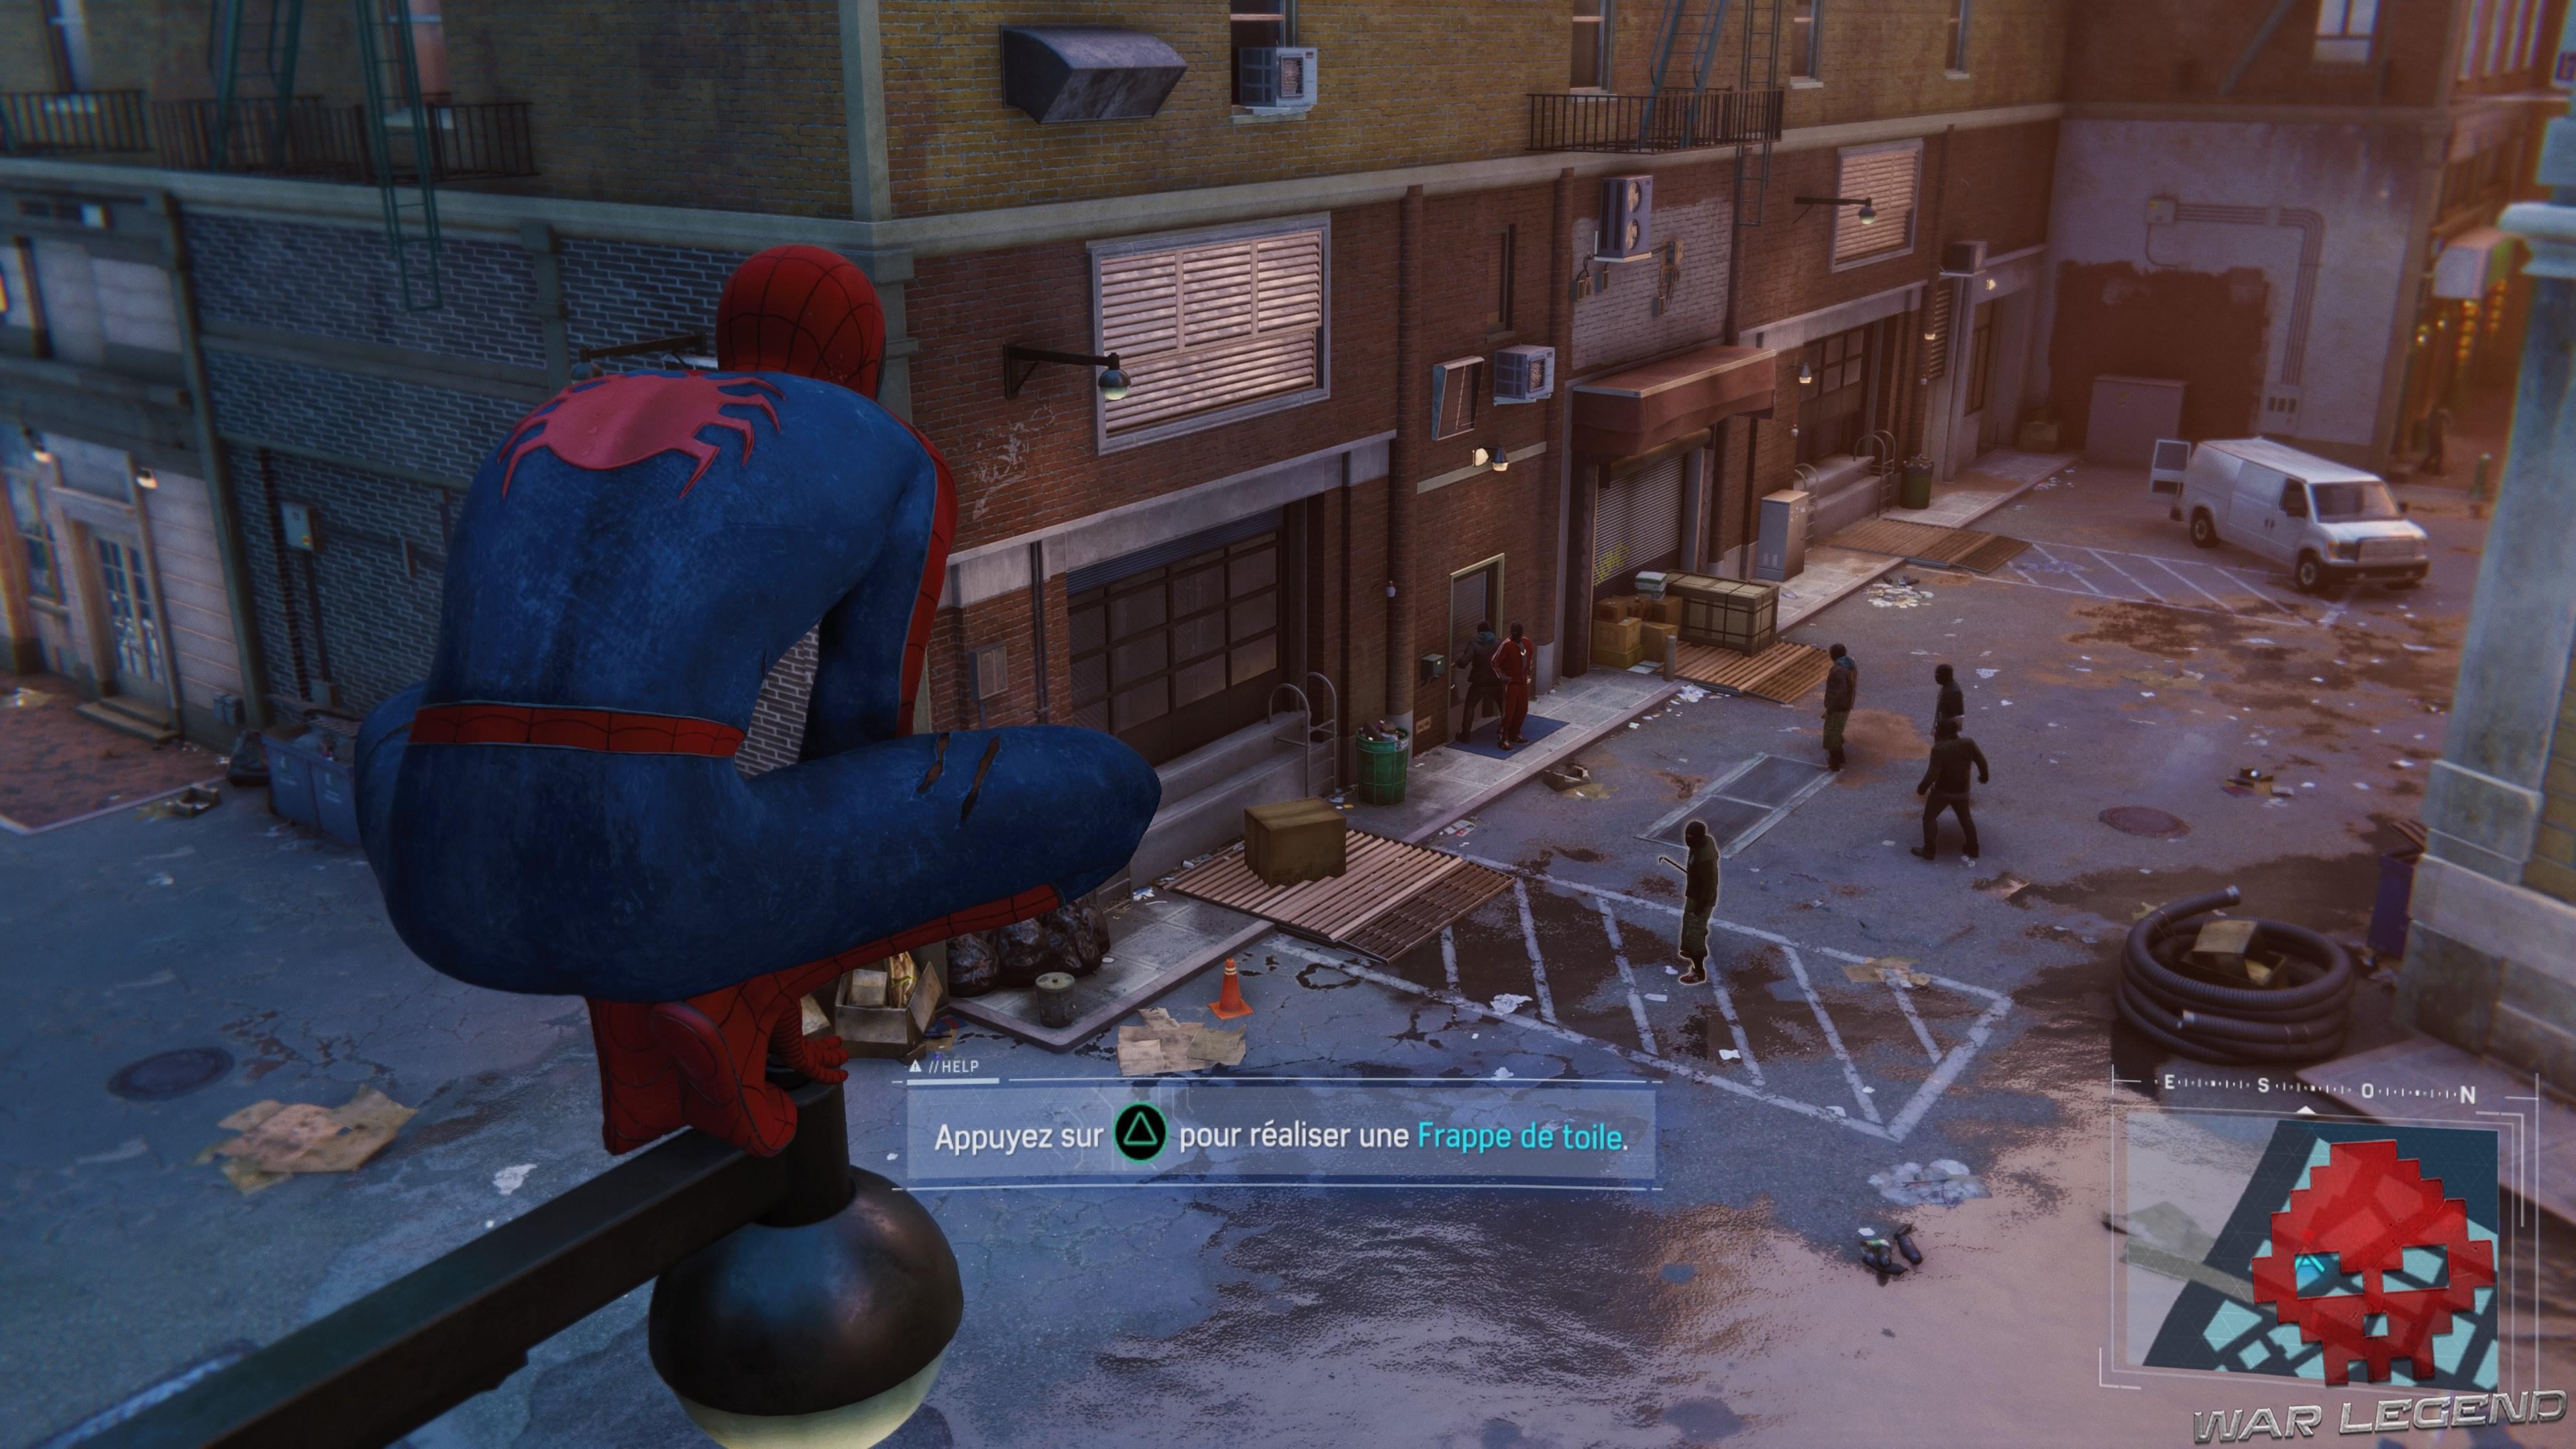 Spider-Man surprend des cambrioleurs